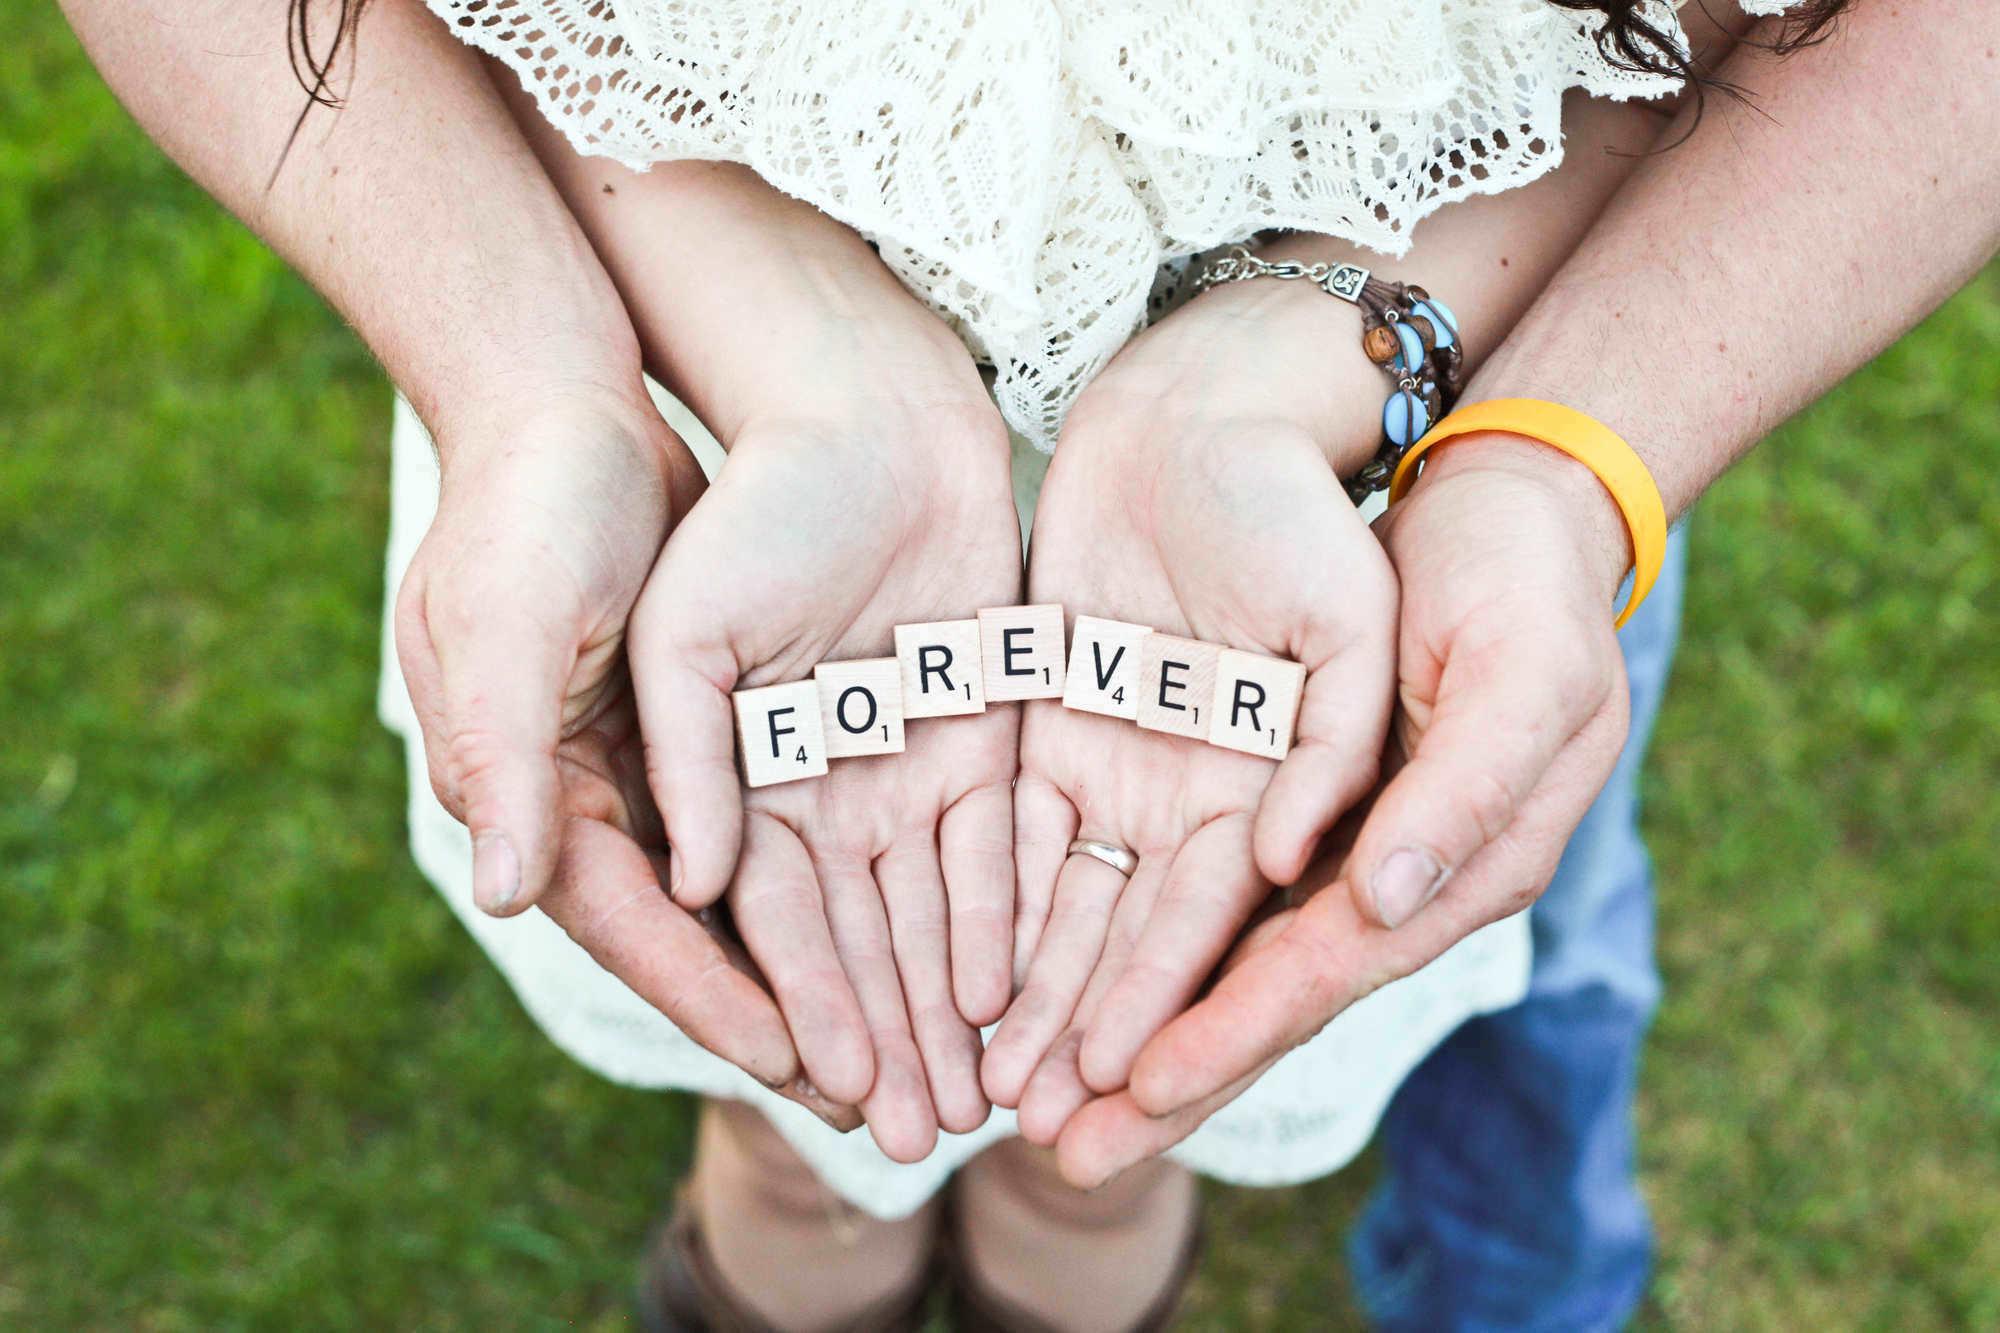 Samen de liefde en positiviteit delen